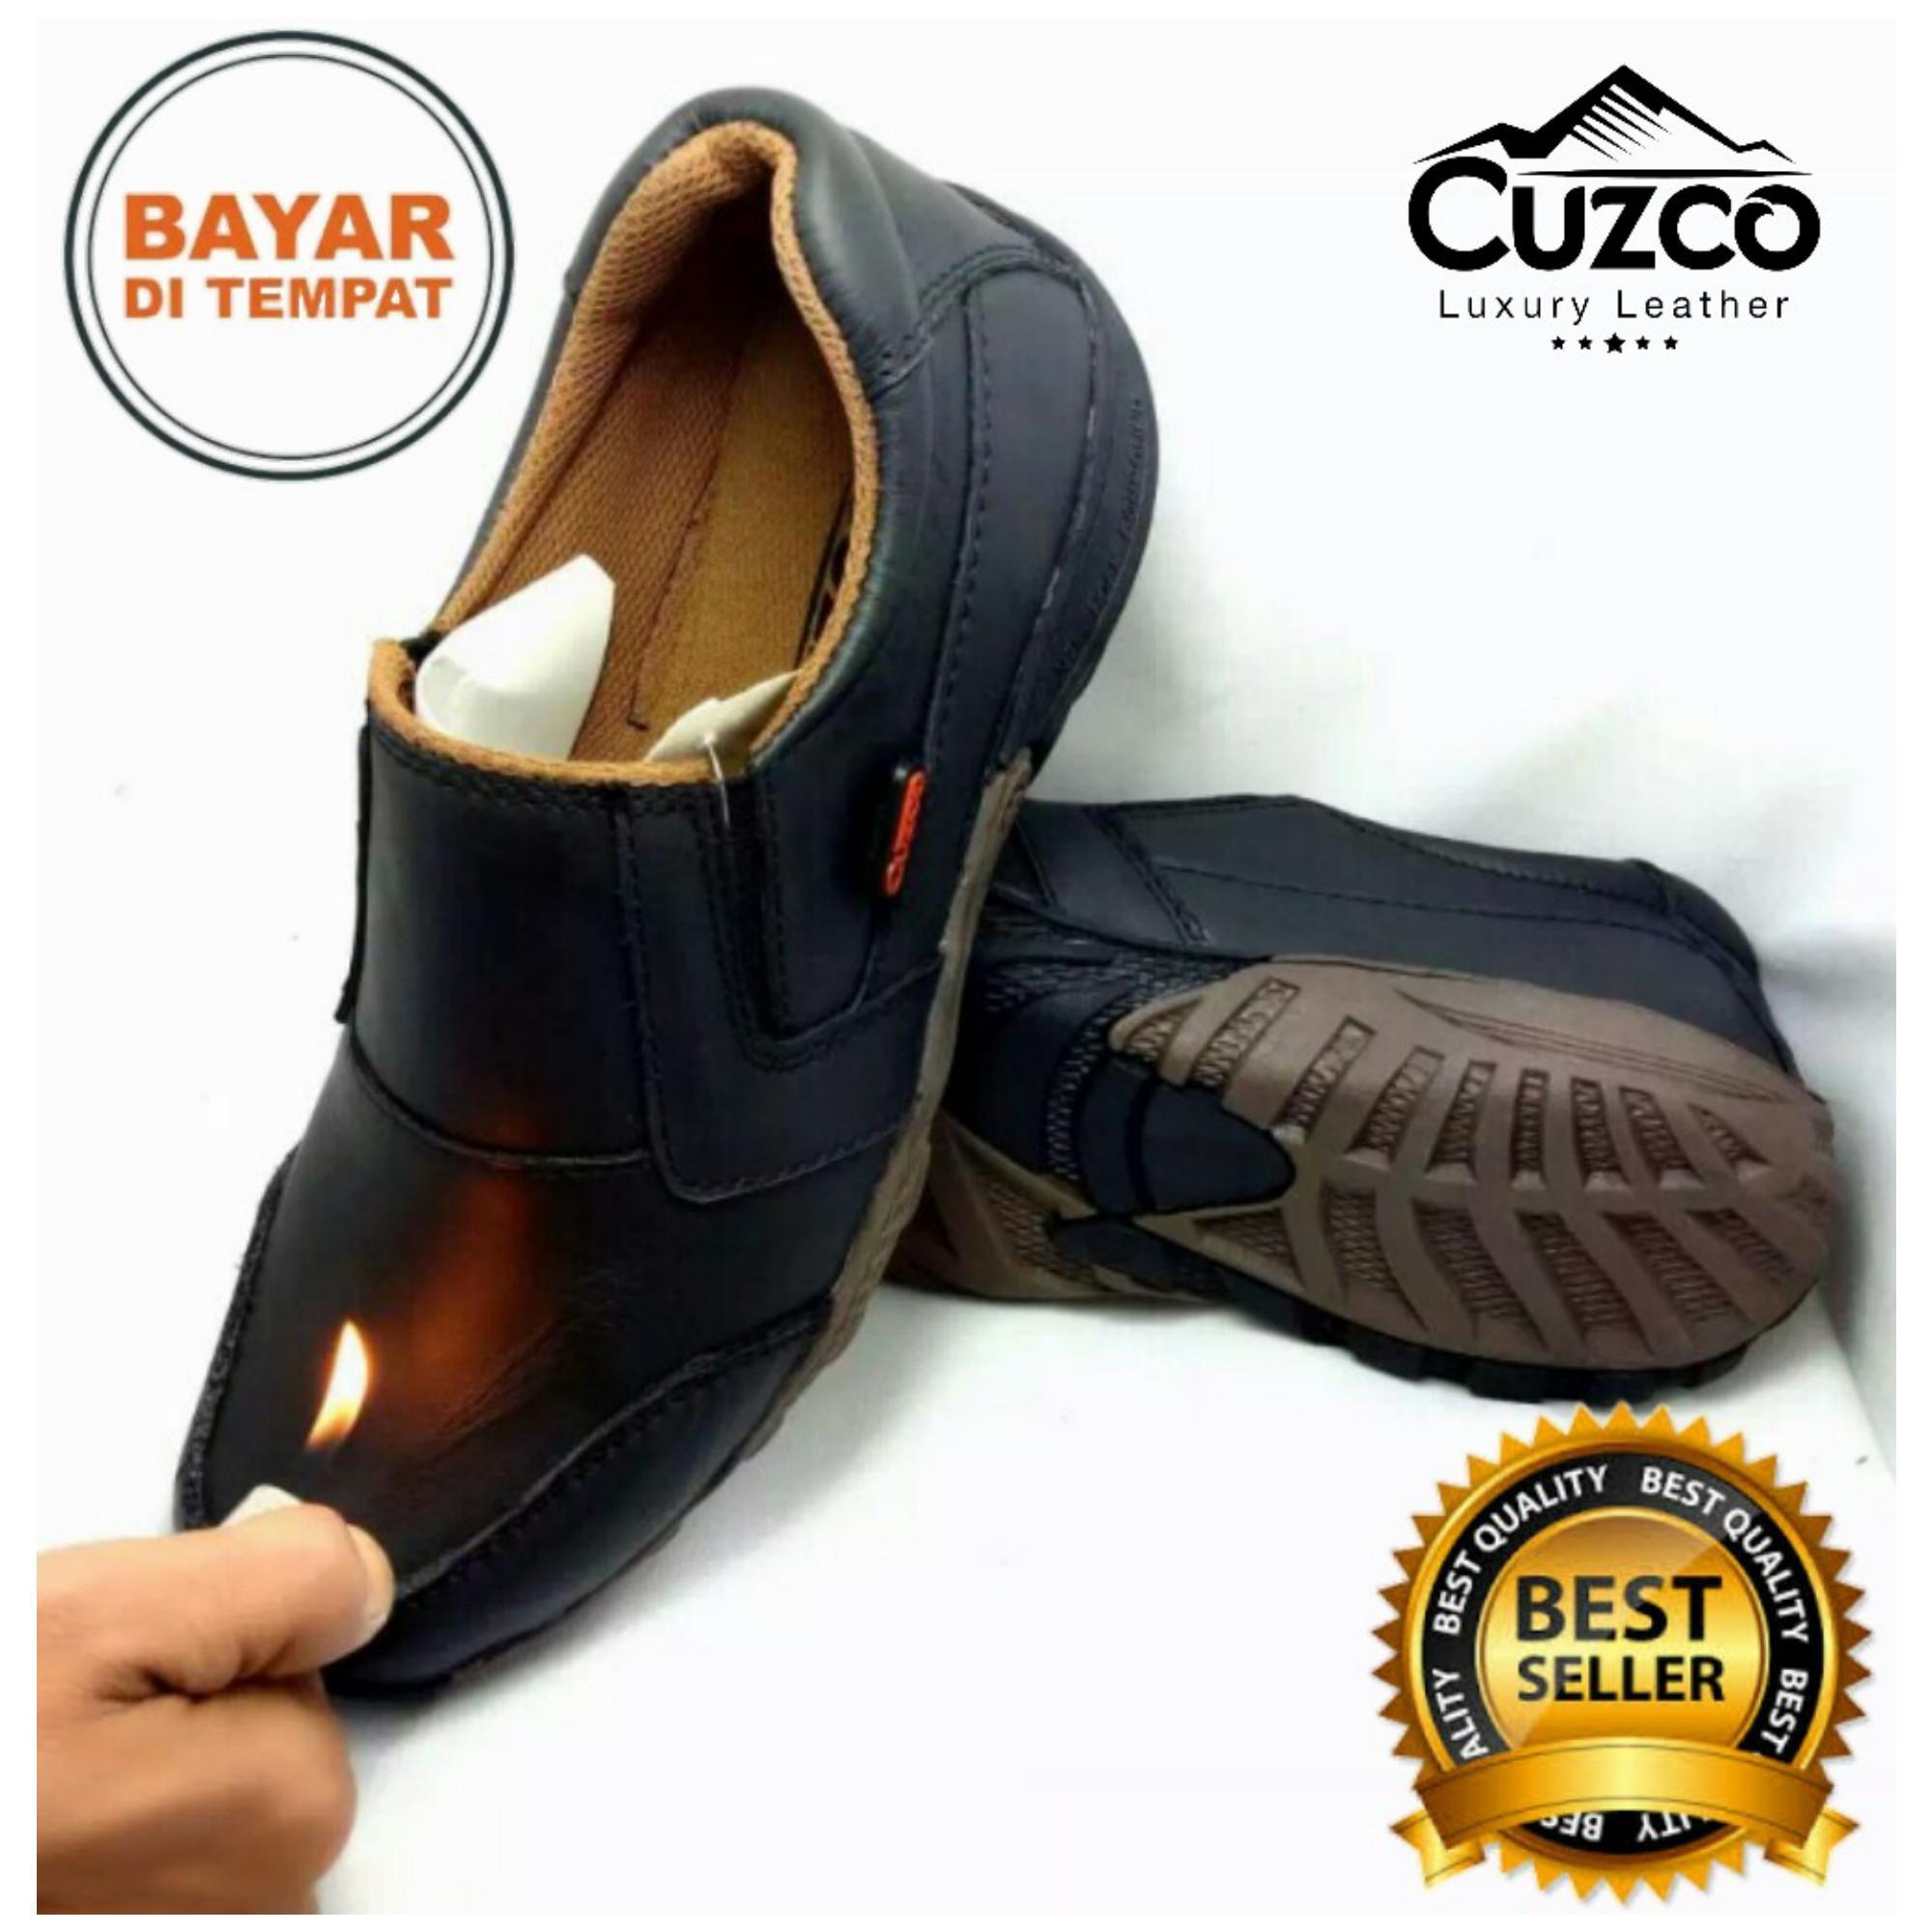 Gila Sepatu Formal Pria Pantopel Cevany Veil Kulit Asli Casual Anti Licin Cuzco